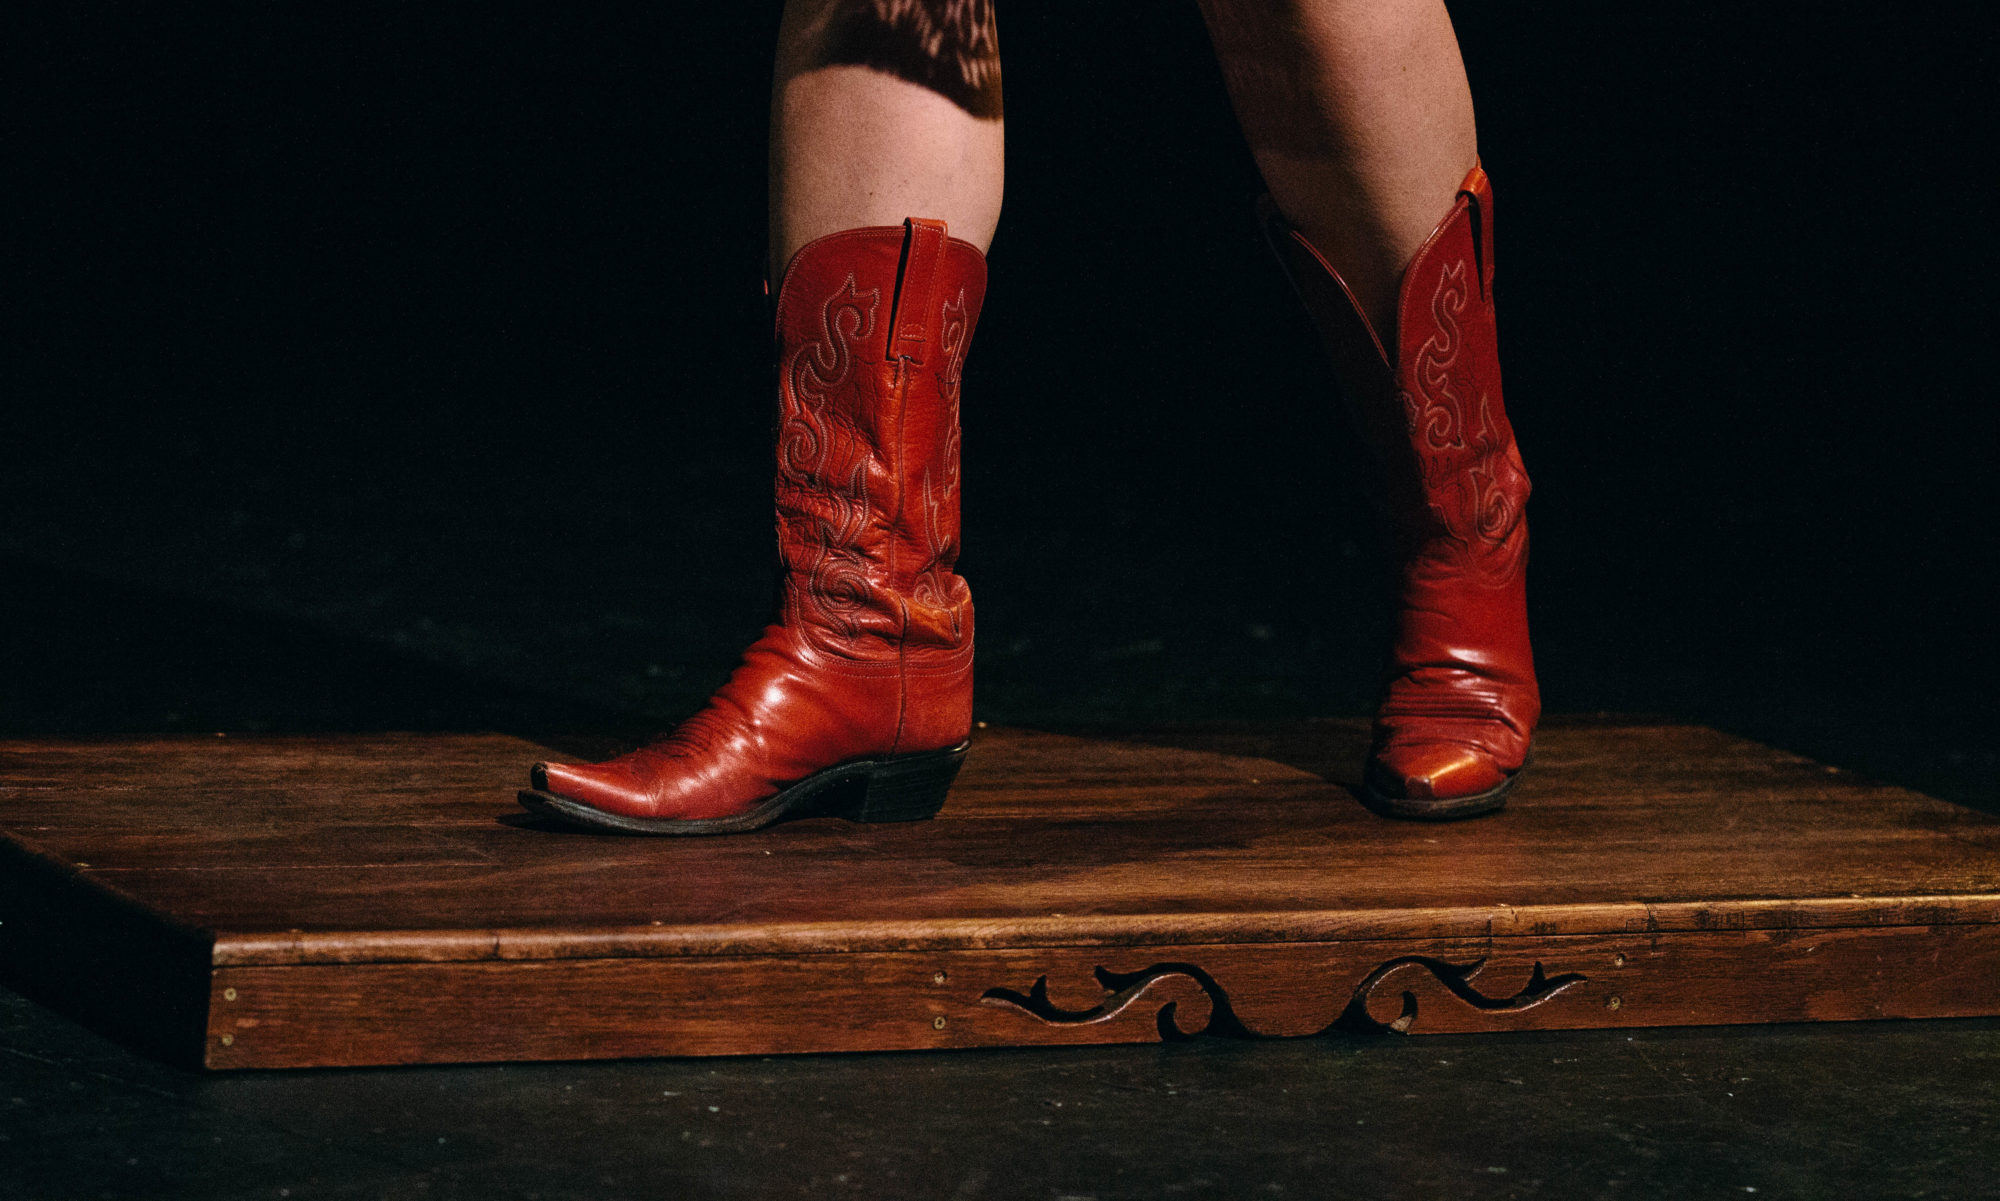 Janet Schroeder: Percussive Dance Scholar, Performer, Teacher